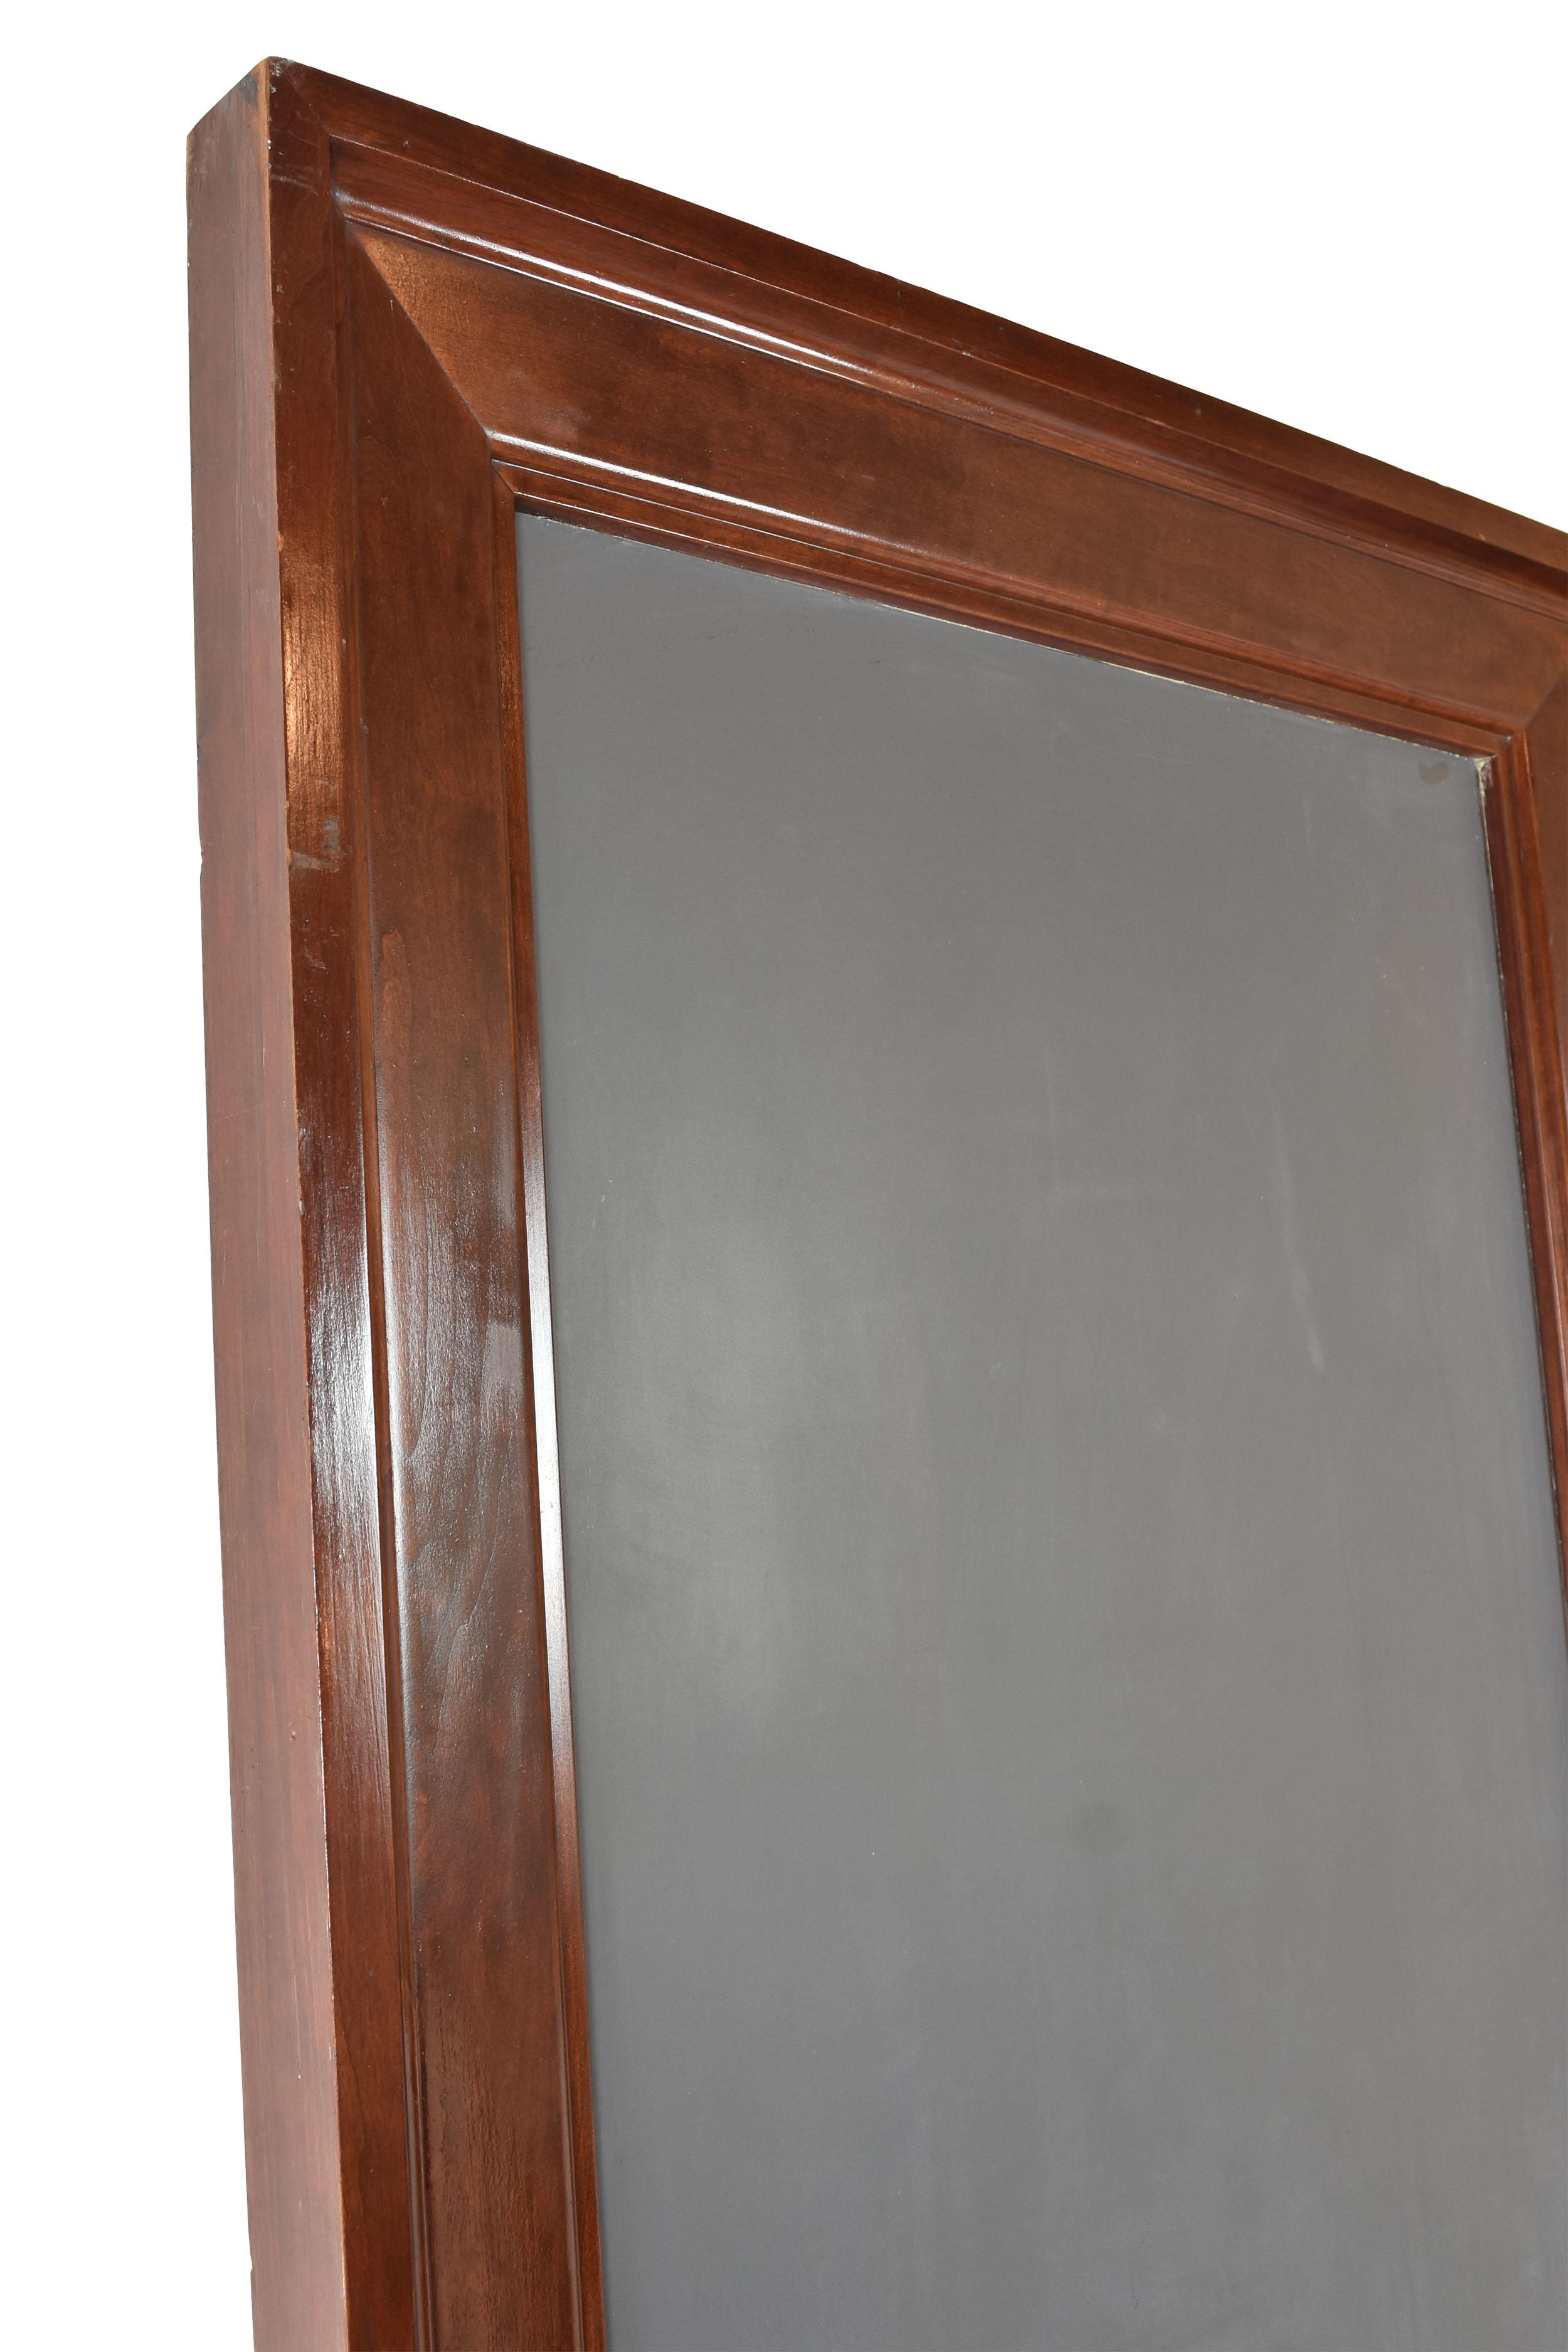 48048 rectangle chalkboard01.jpg